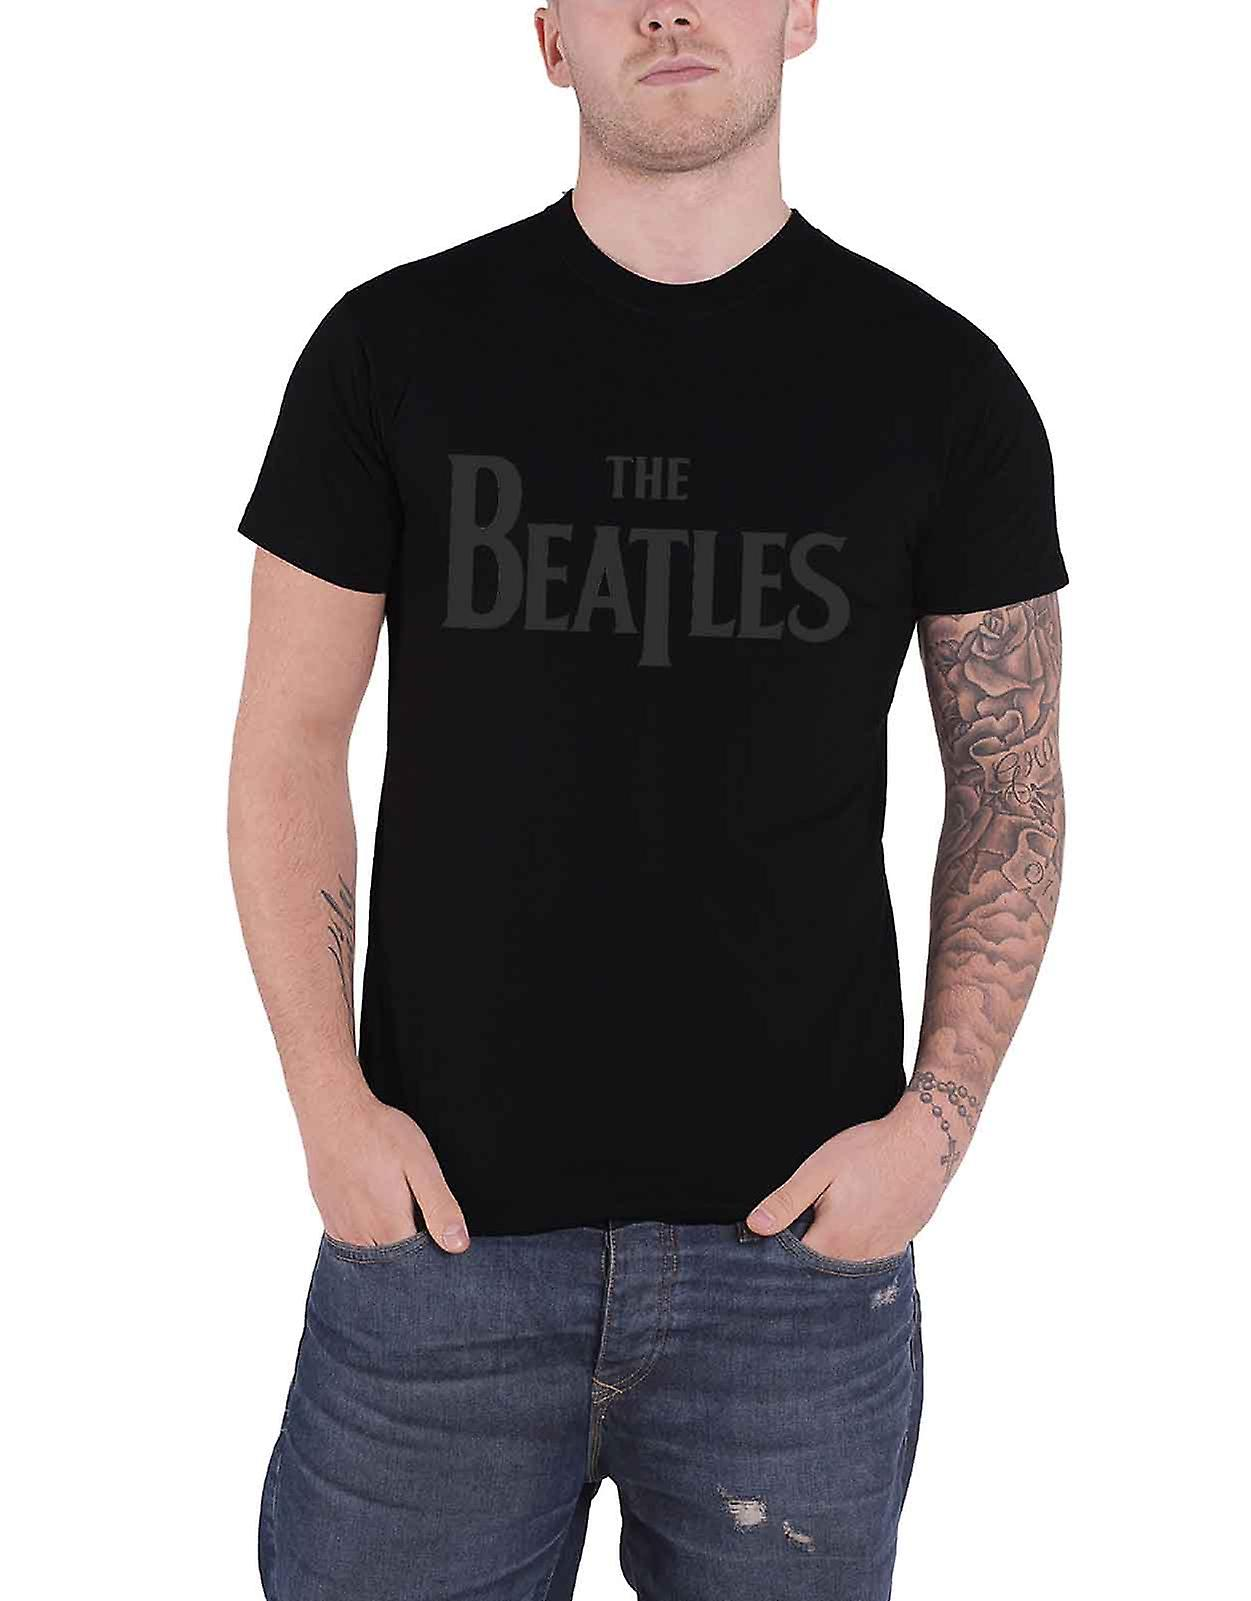 New Men/'s The Beatles Black T-Shirt